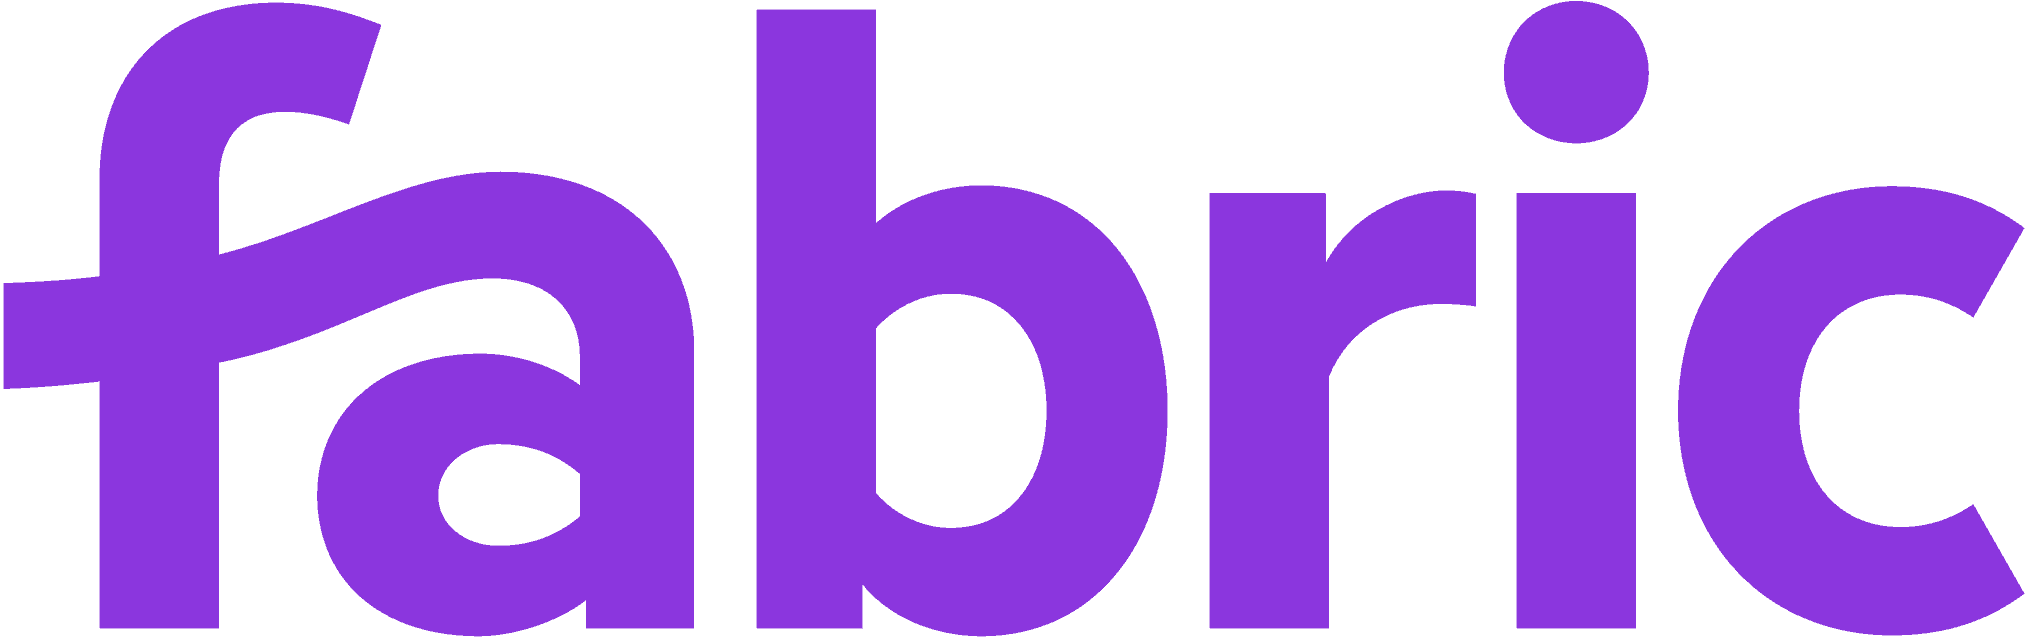 fabric life new logo